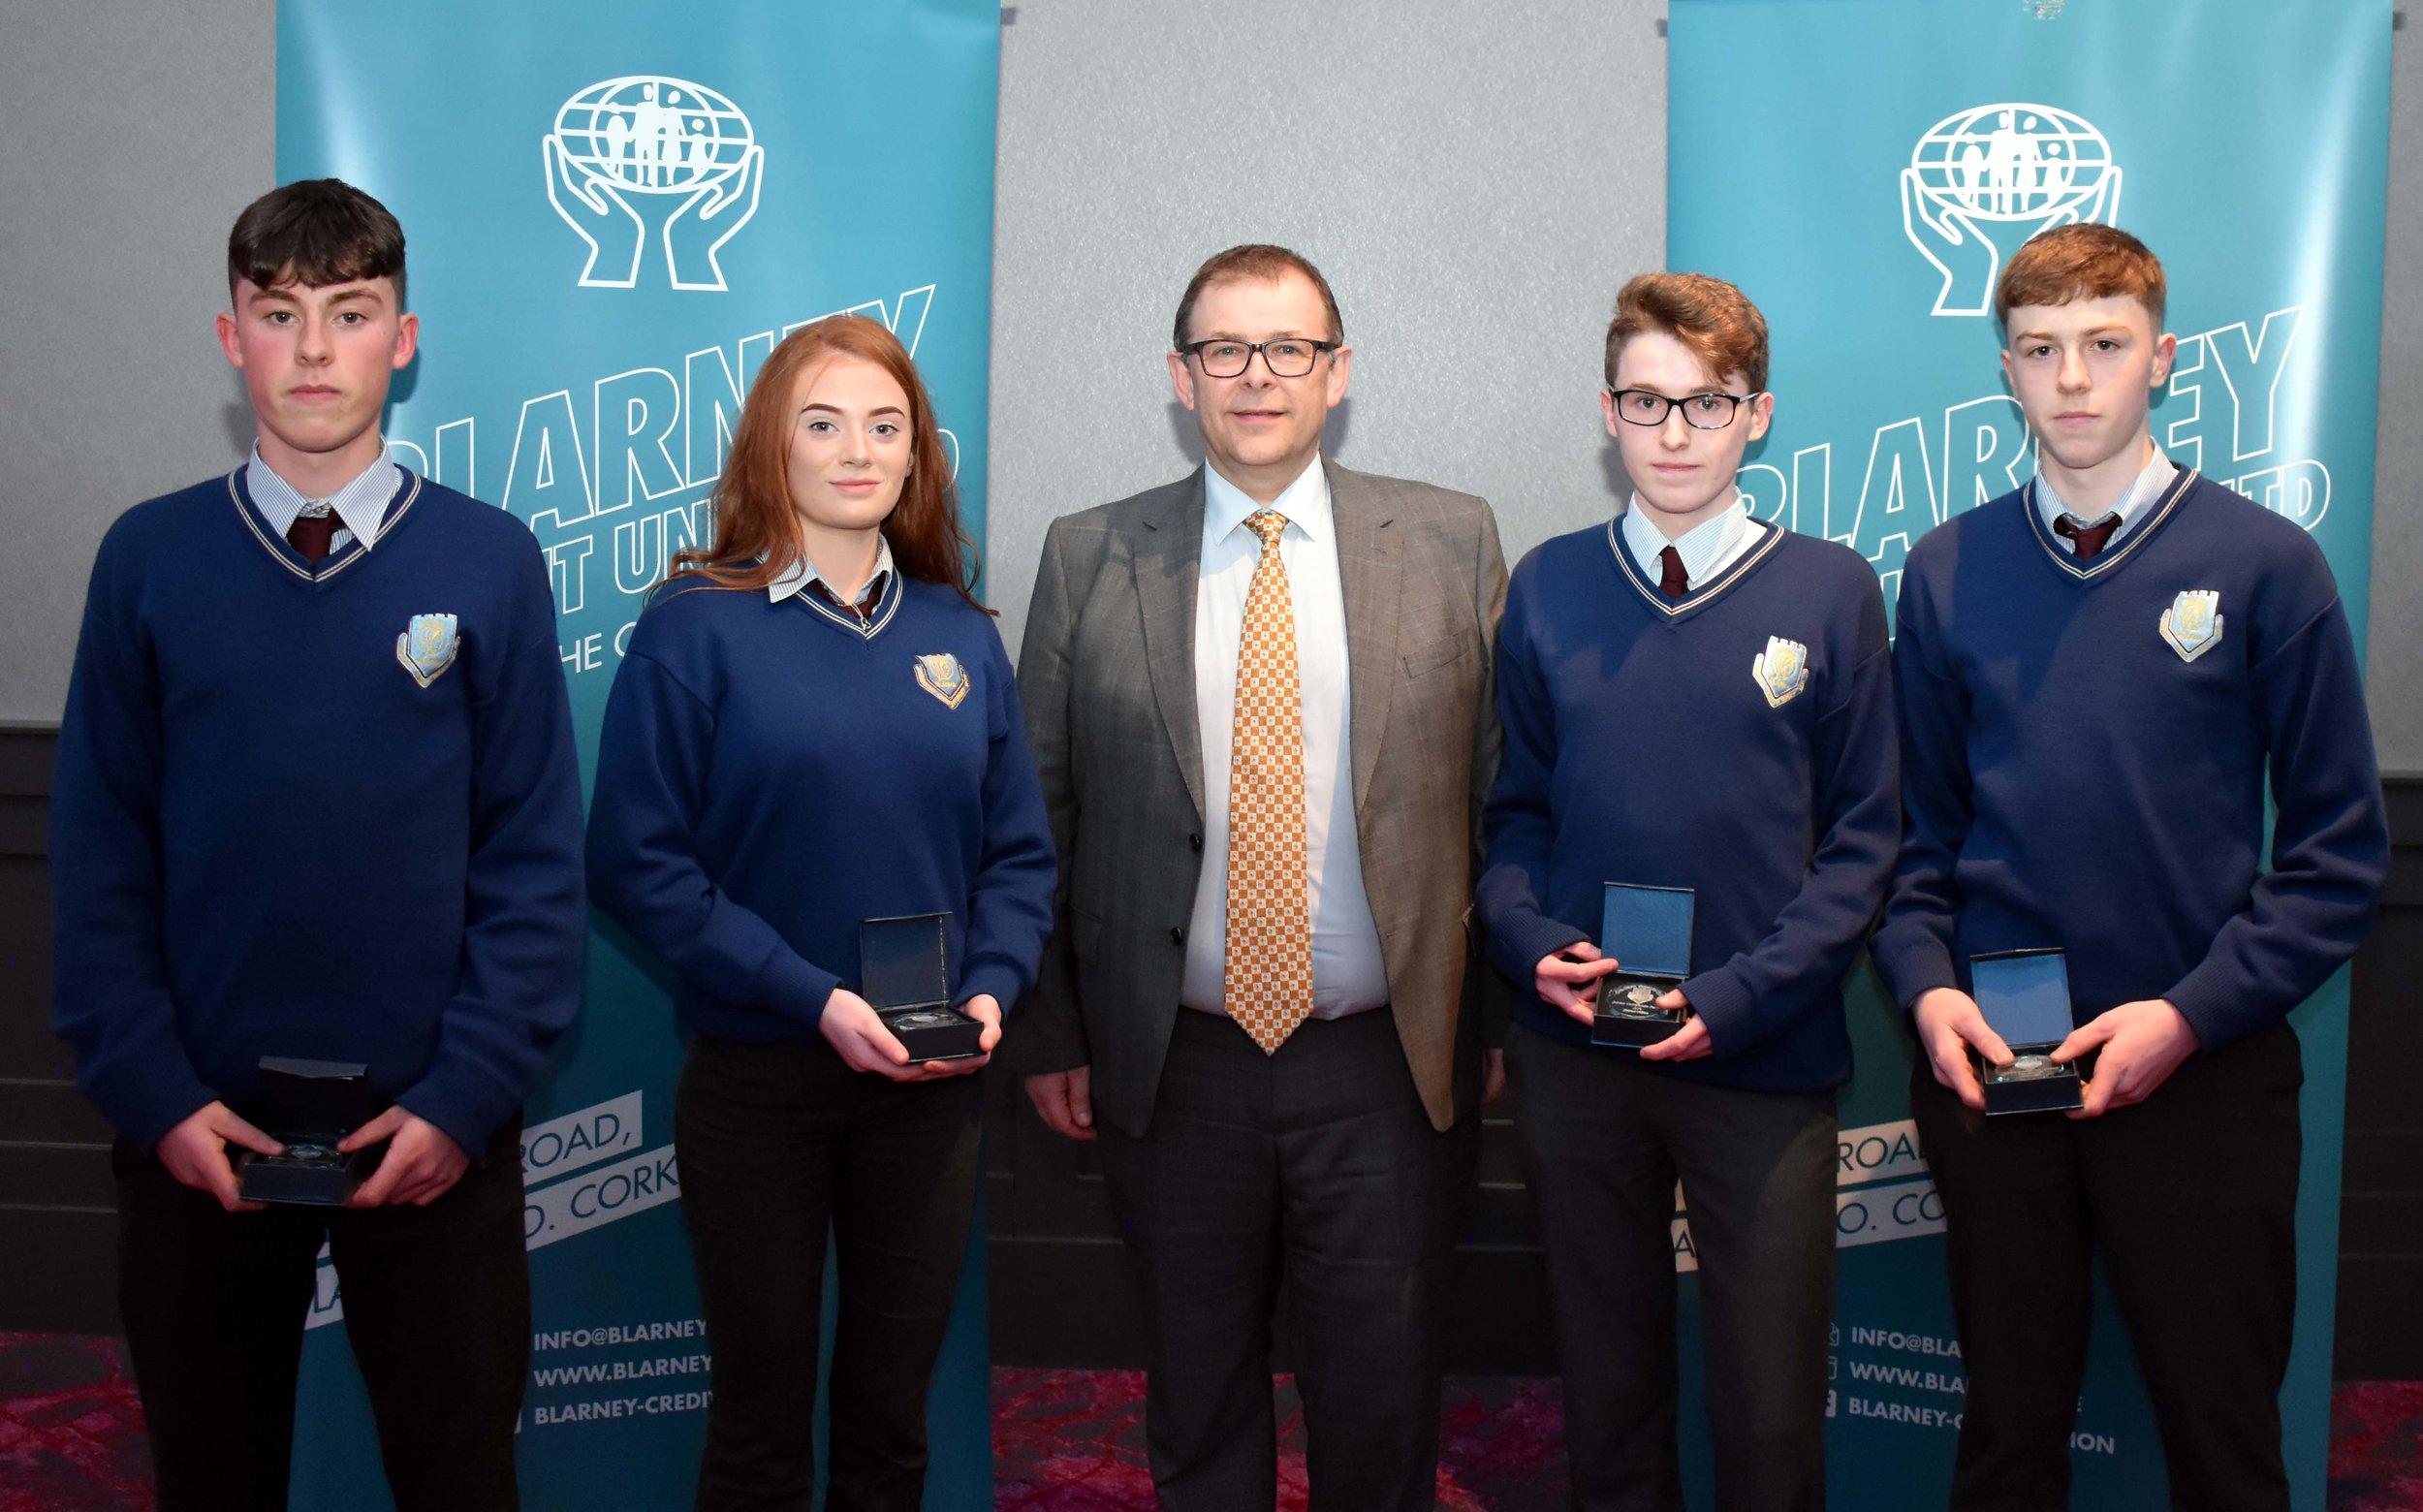 Junior Subject Award winners: Niall Cremin (German), Danielle Hendley (Home Economics), Emmet O' Shea (Art), Conor Joyce (Woodwork) (Pictured with Mr. Mark McGloughlin - BOM and Blarney Credit Union)